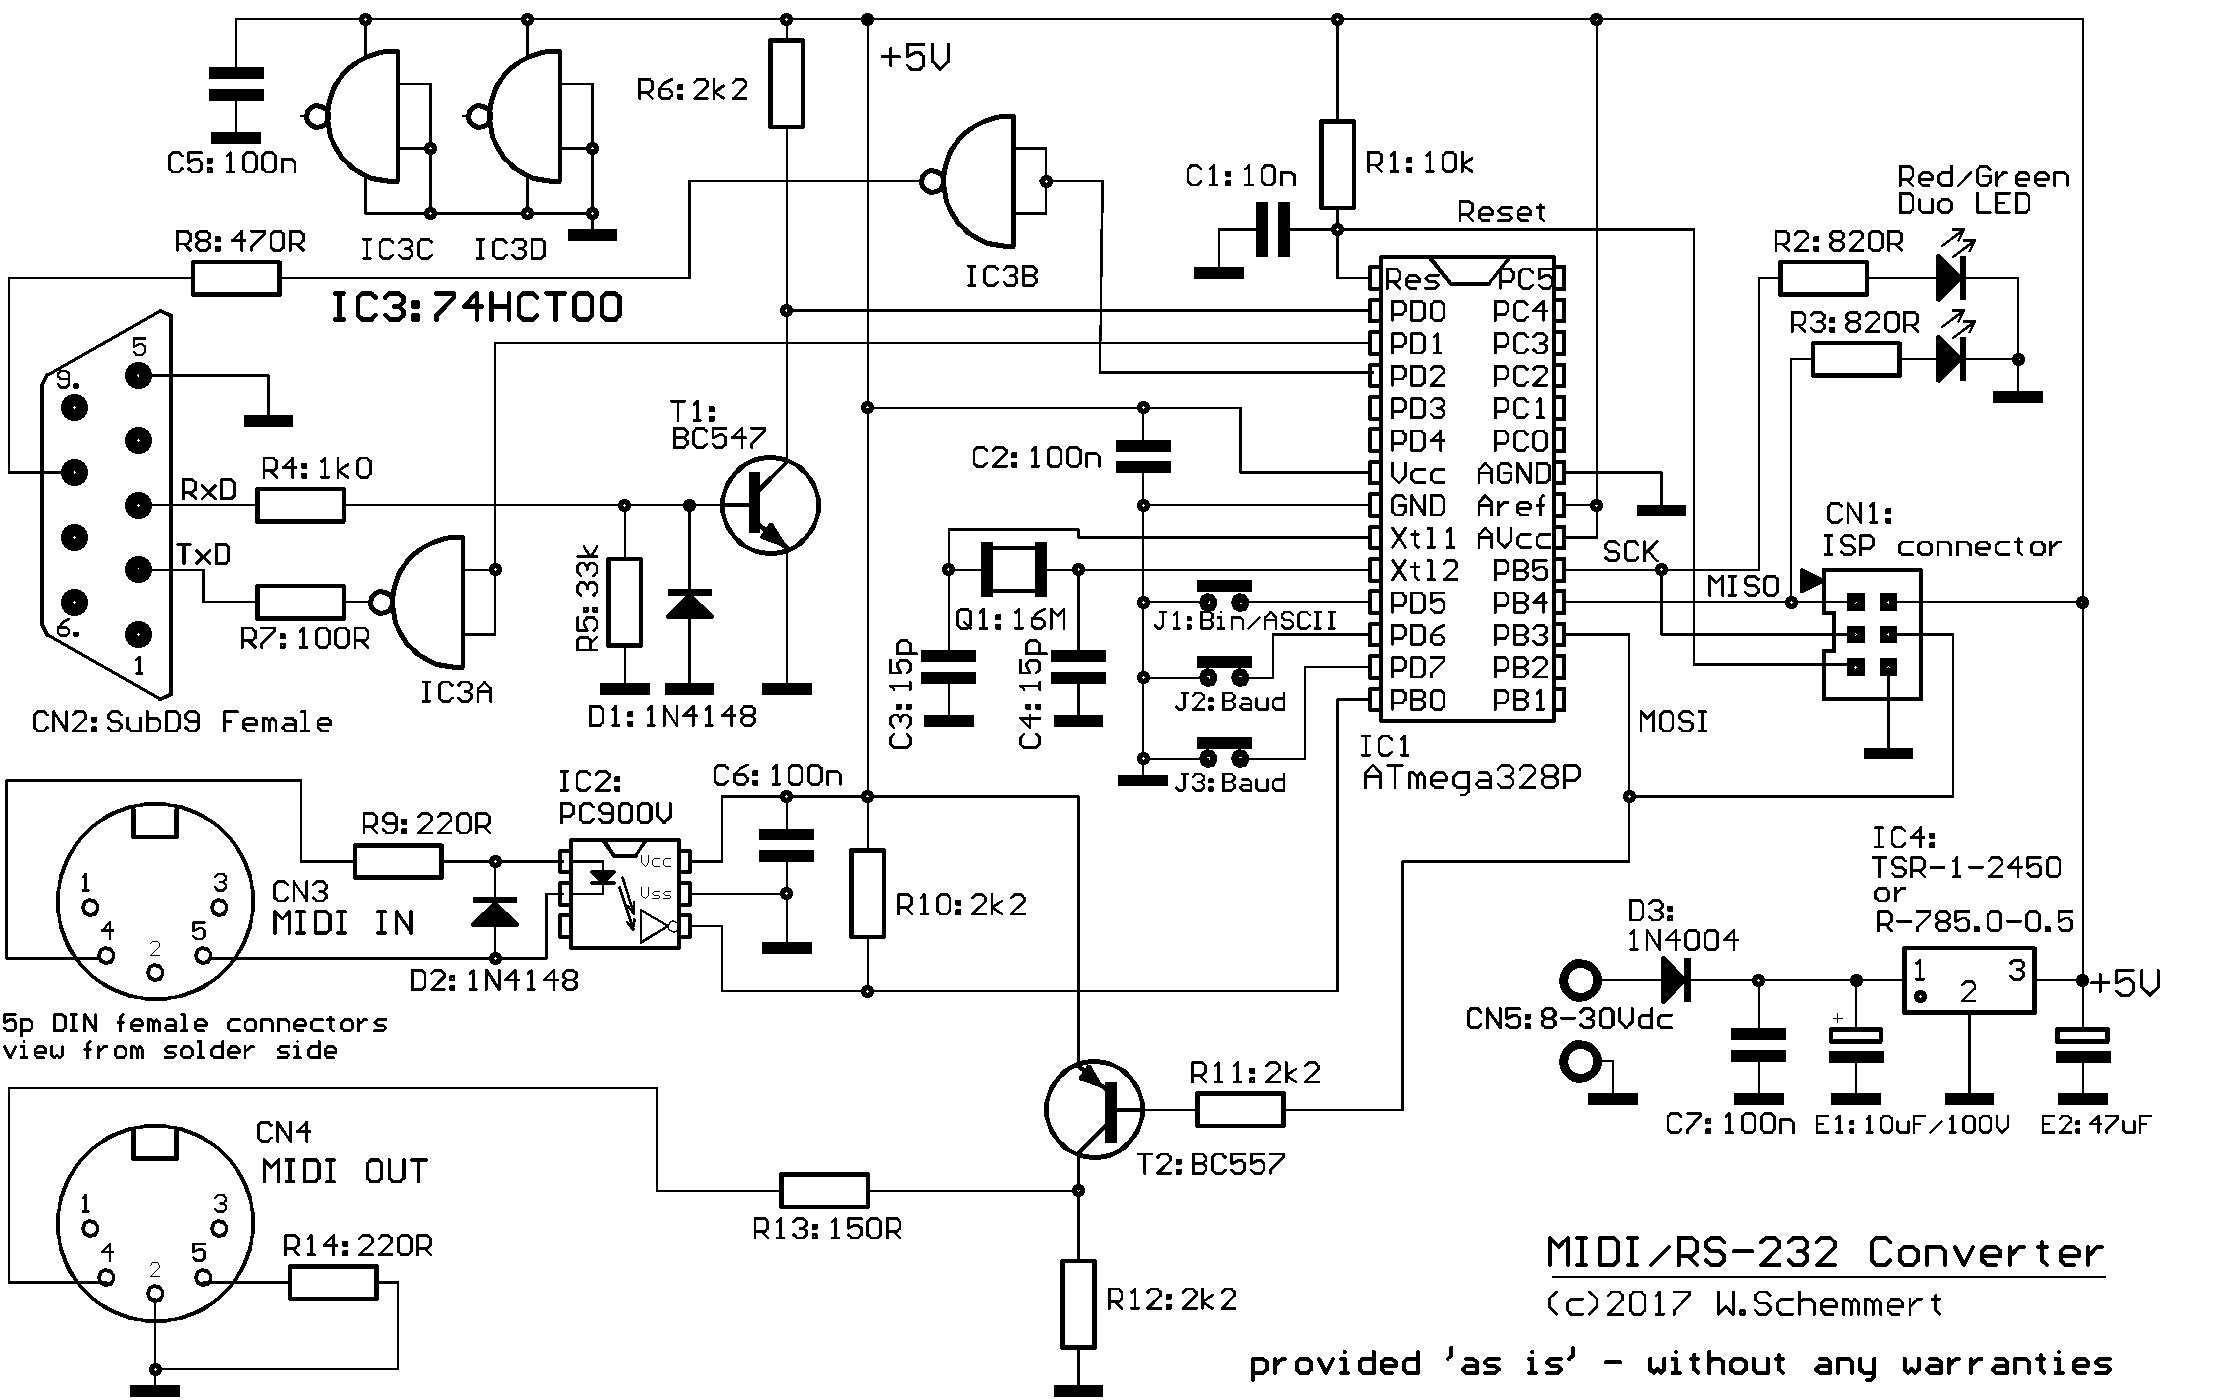 MIDI / RS-232 Converter